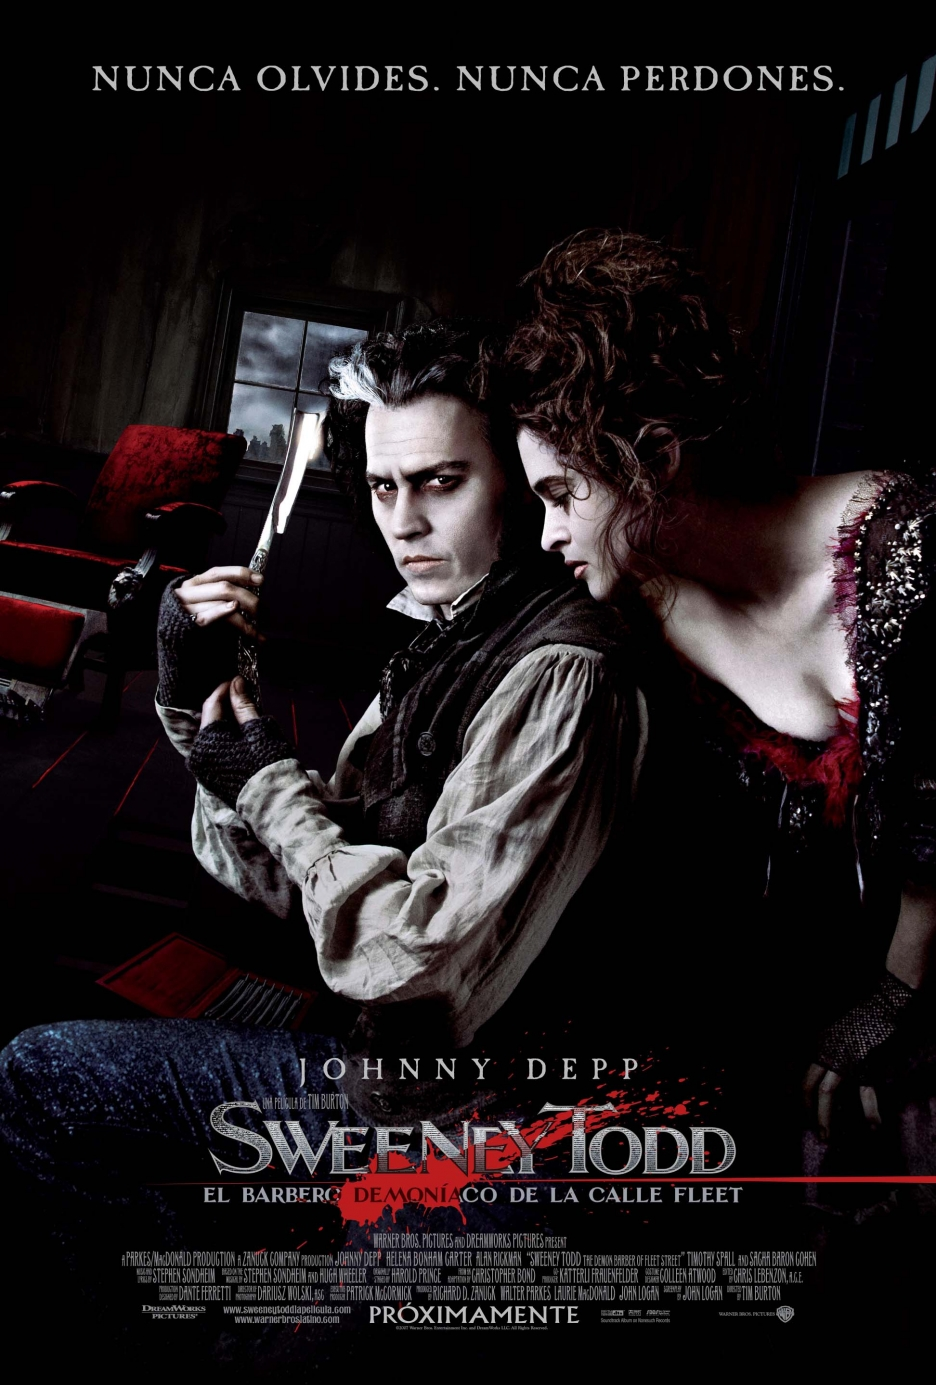 Sweeney Todd: The Demon Barber of Fleet Street สวีนนีย์ ท็อดด์ บาร์เบอร์หฤโหดแห่งฟลีทสตรีท [HD][พากย์ไทย]